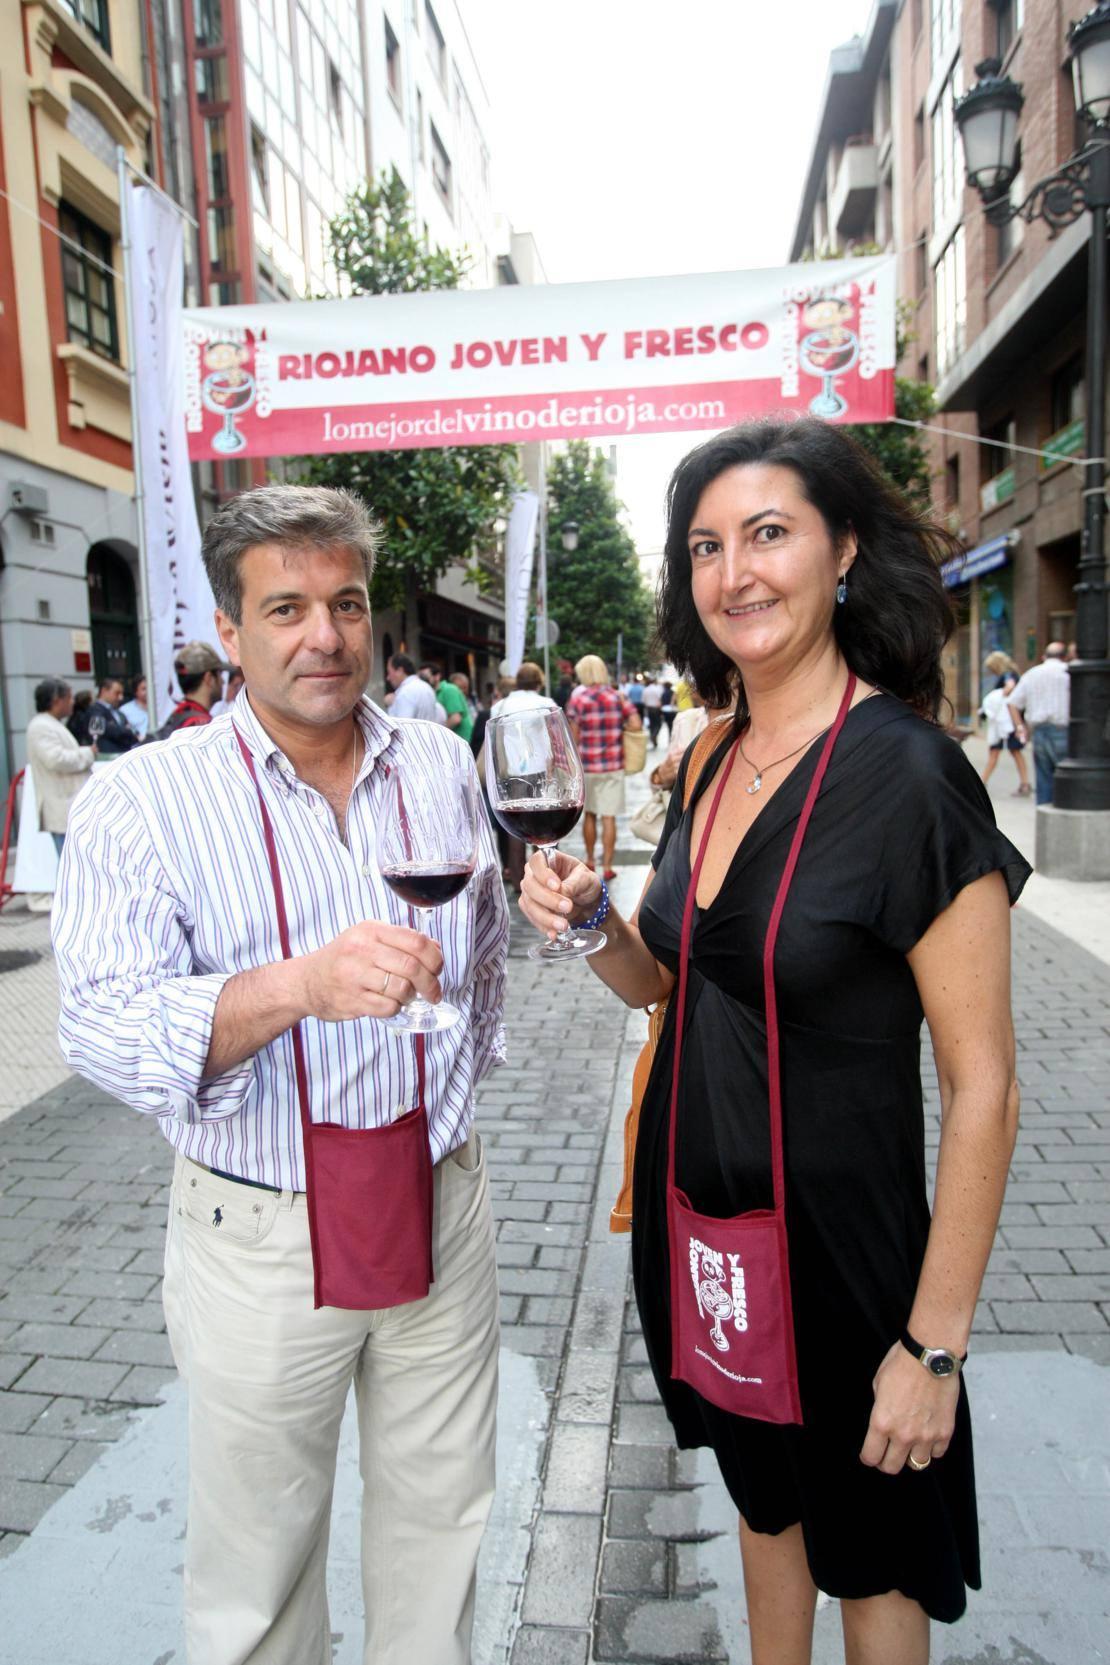 Riojano Joven y Fresco Oviedo